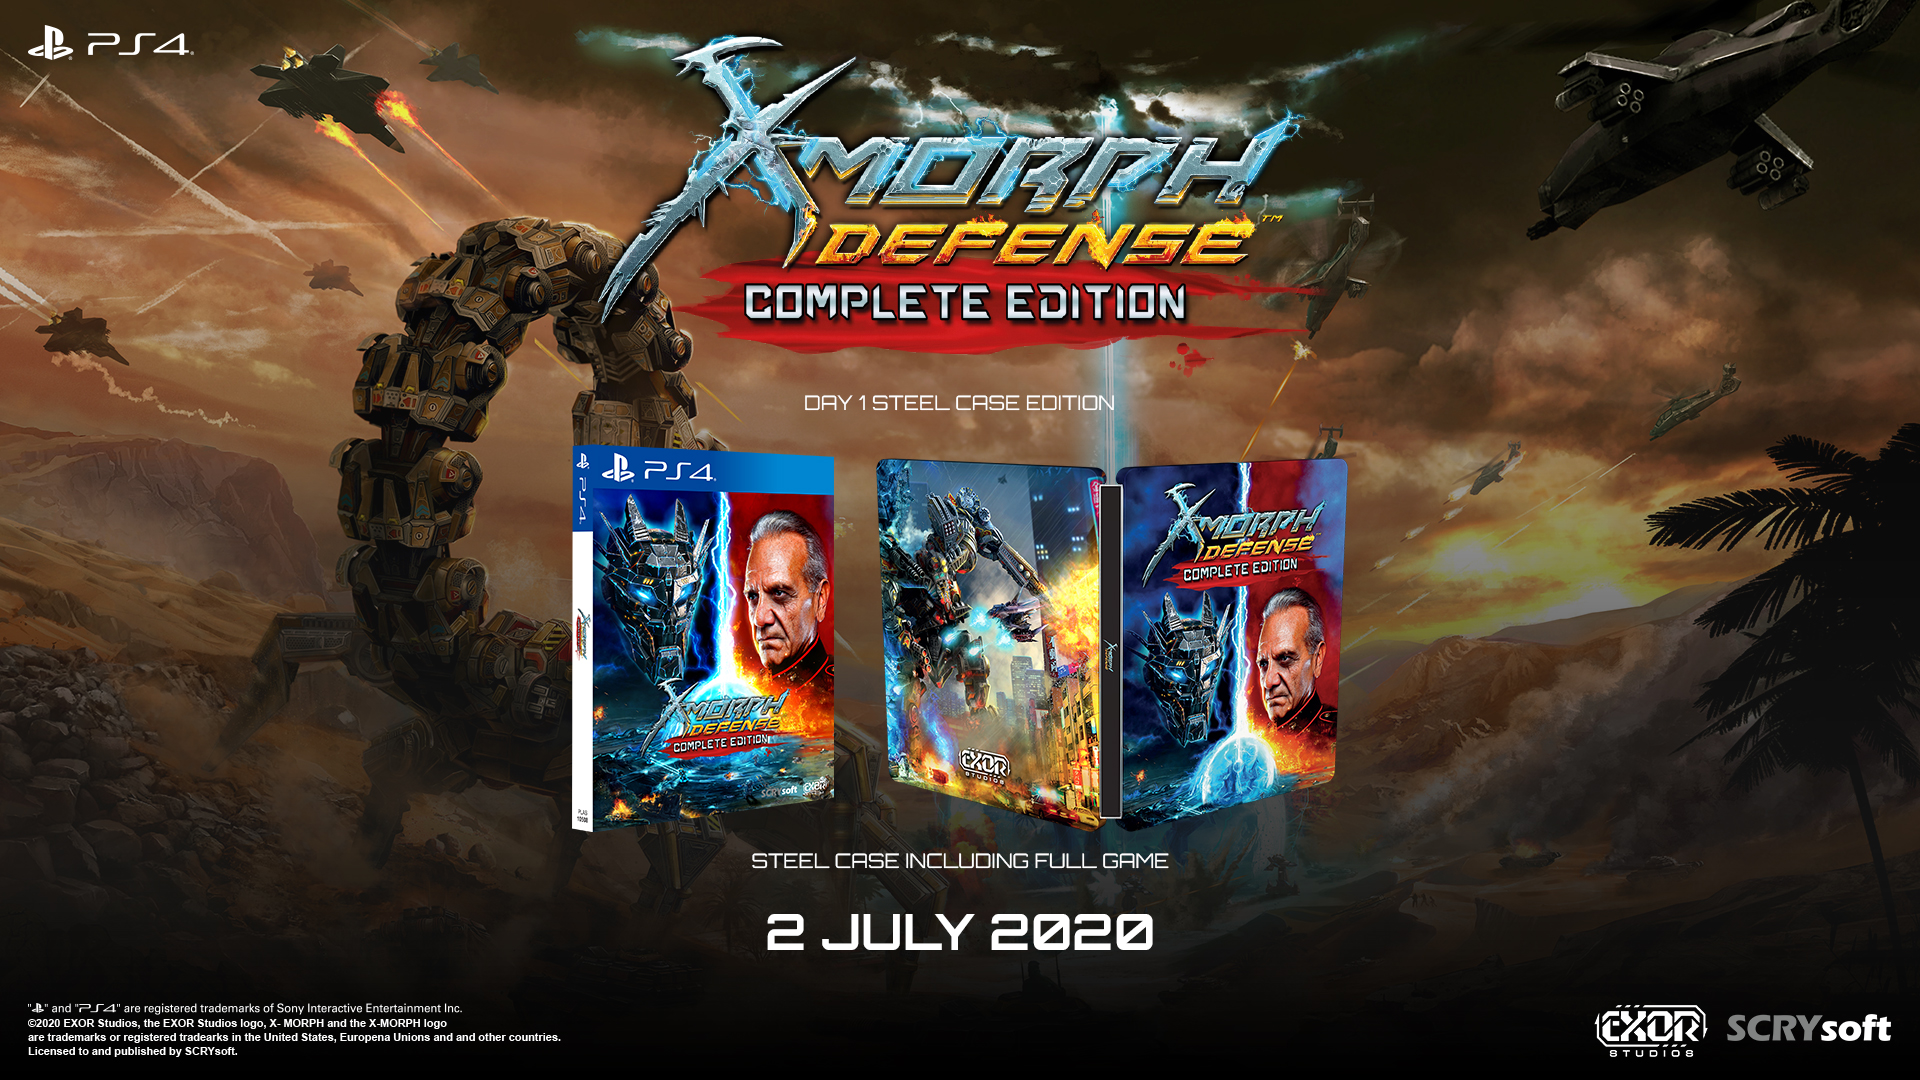 X Morph Defense Complete Edition Beauty